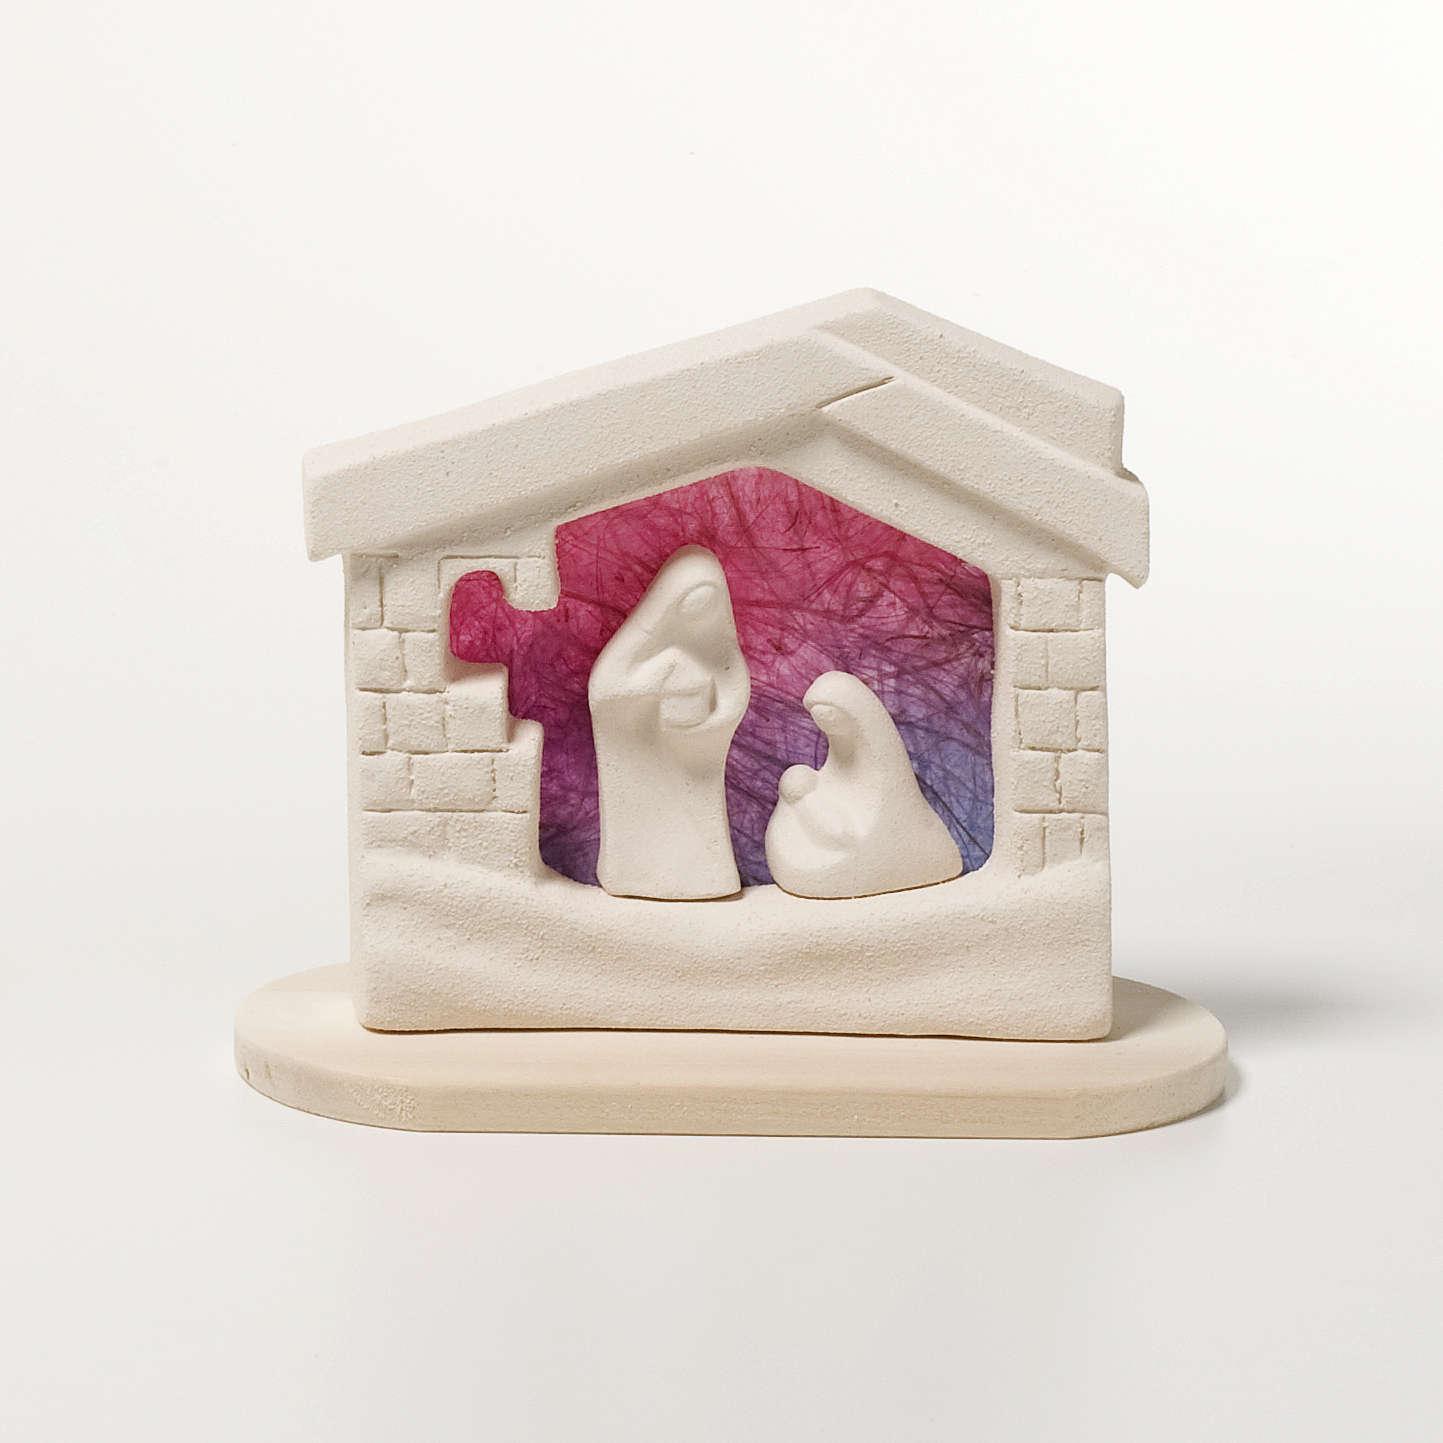 Presepe casetta Natale su base argilla viola 14,5 cm 4